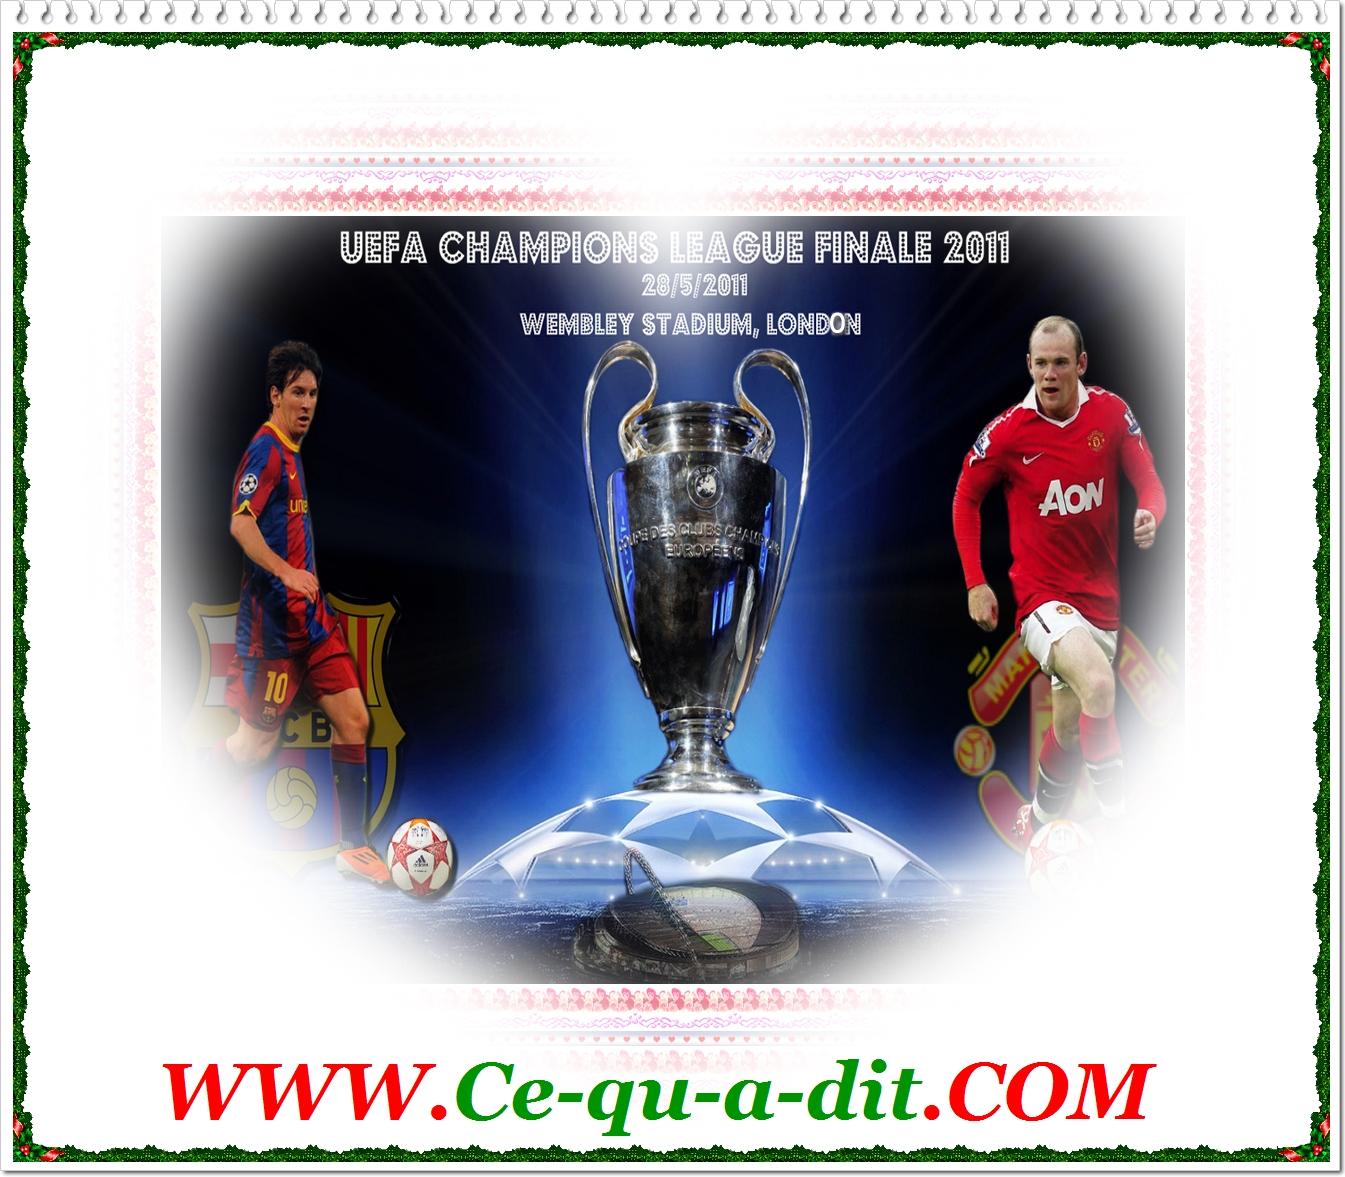 http://3.bp.blogspot.com/-EulPjR3pX9Y/Td68Gz_-gvI/AAAAAAAAEpM/fXfdLb1WDd0/s1600/ce-qu-a-dit-guardiola-finale-barcelone-manchester-28-mai-2011.jpg